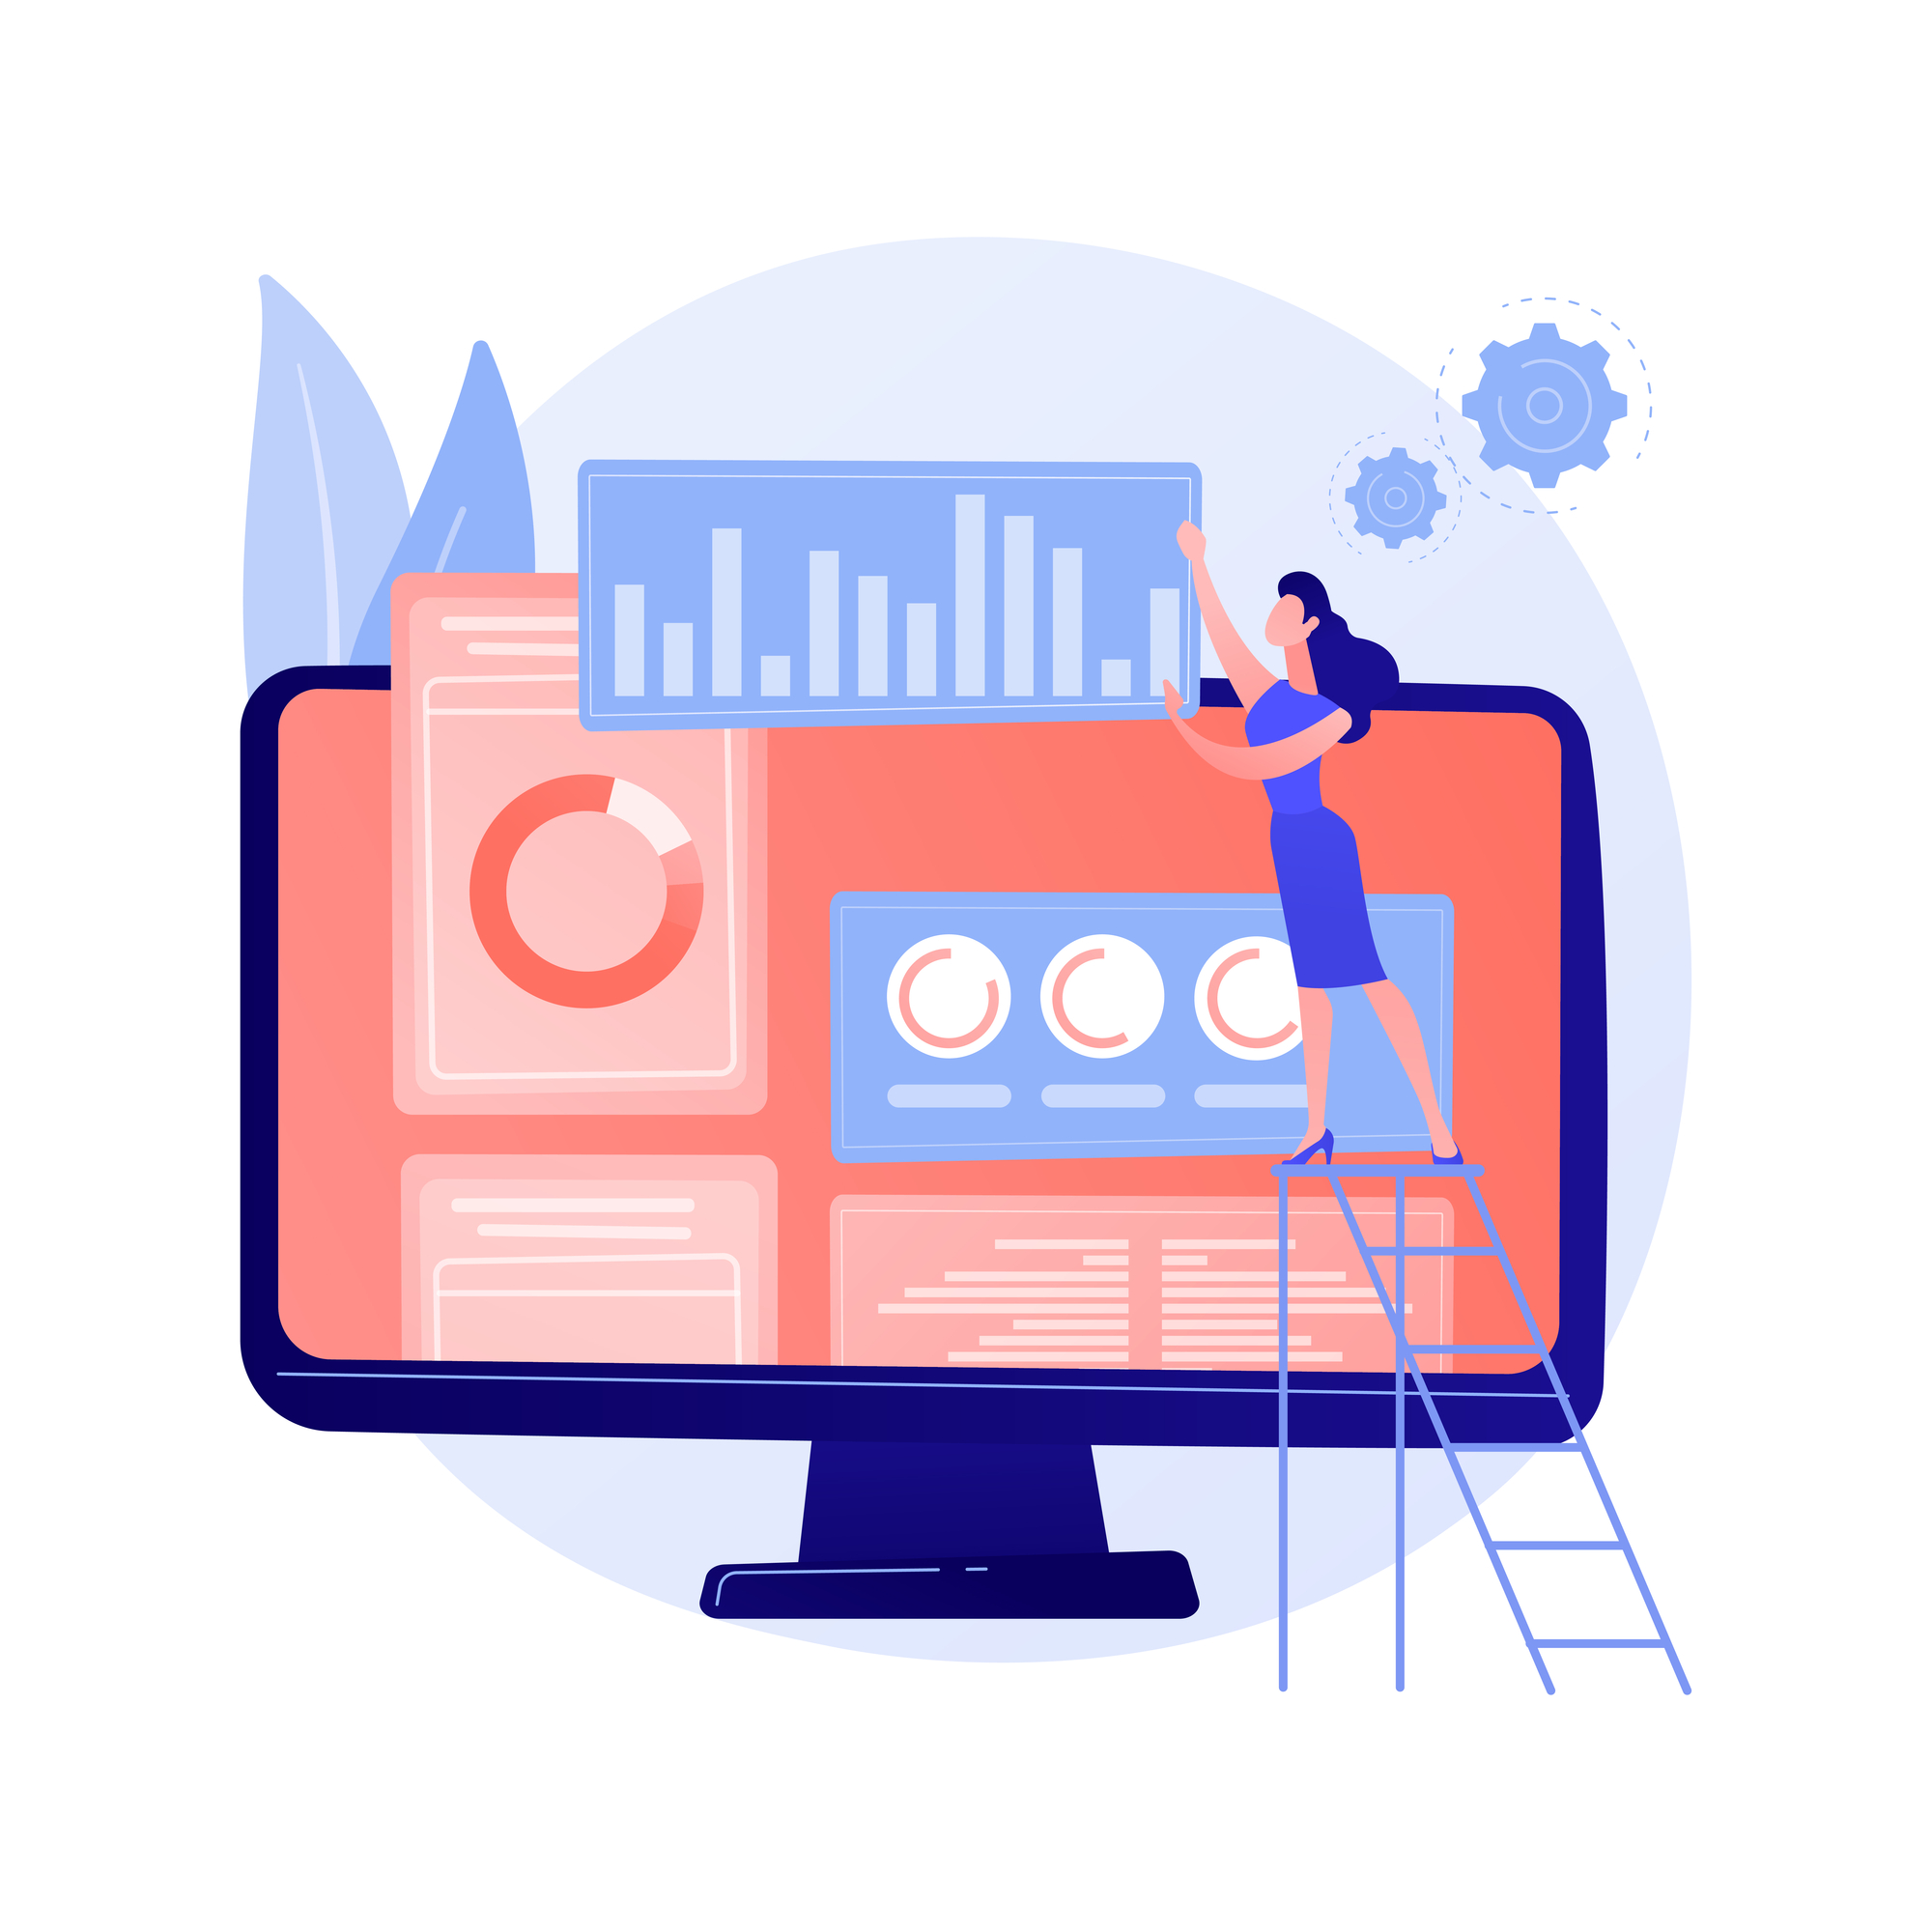 e-Commerce development illustration